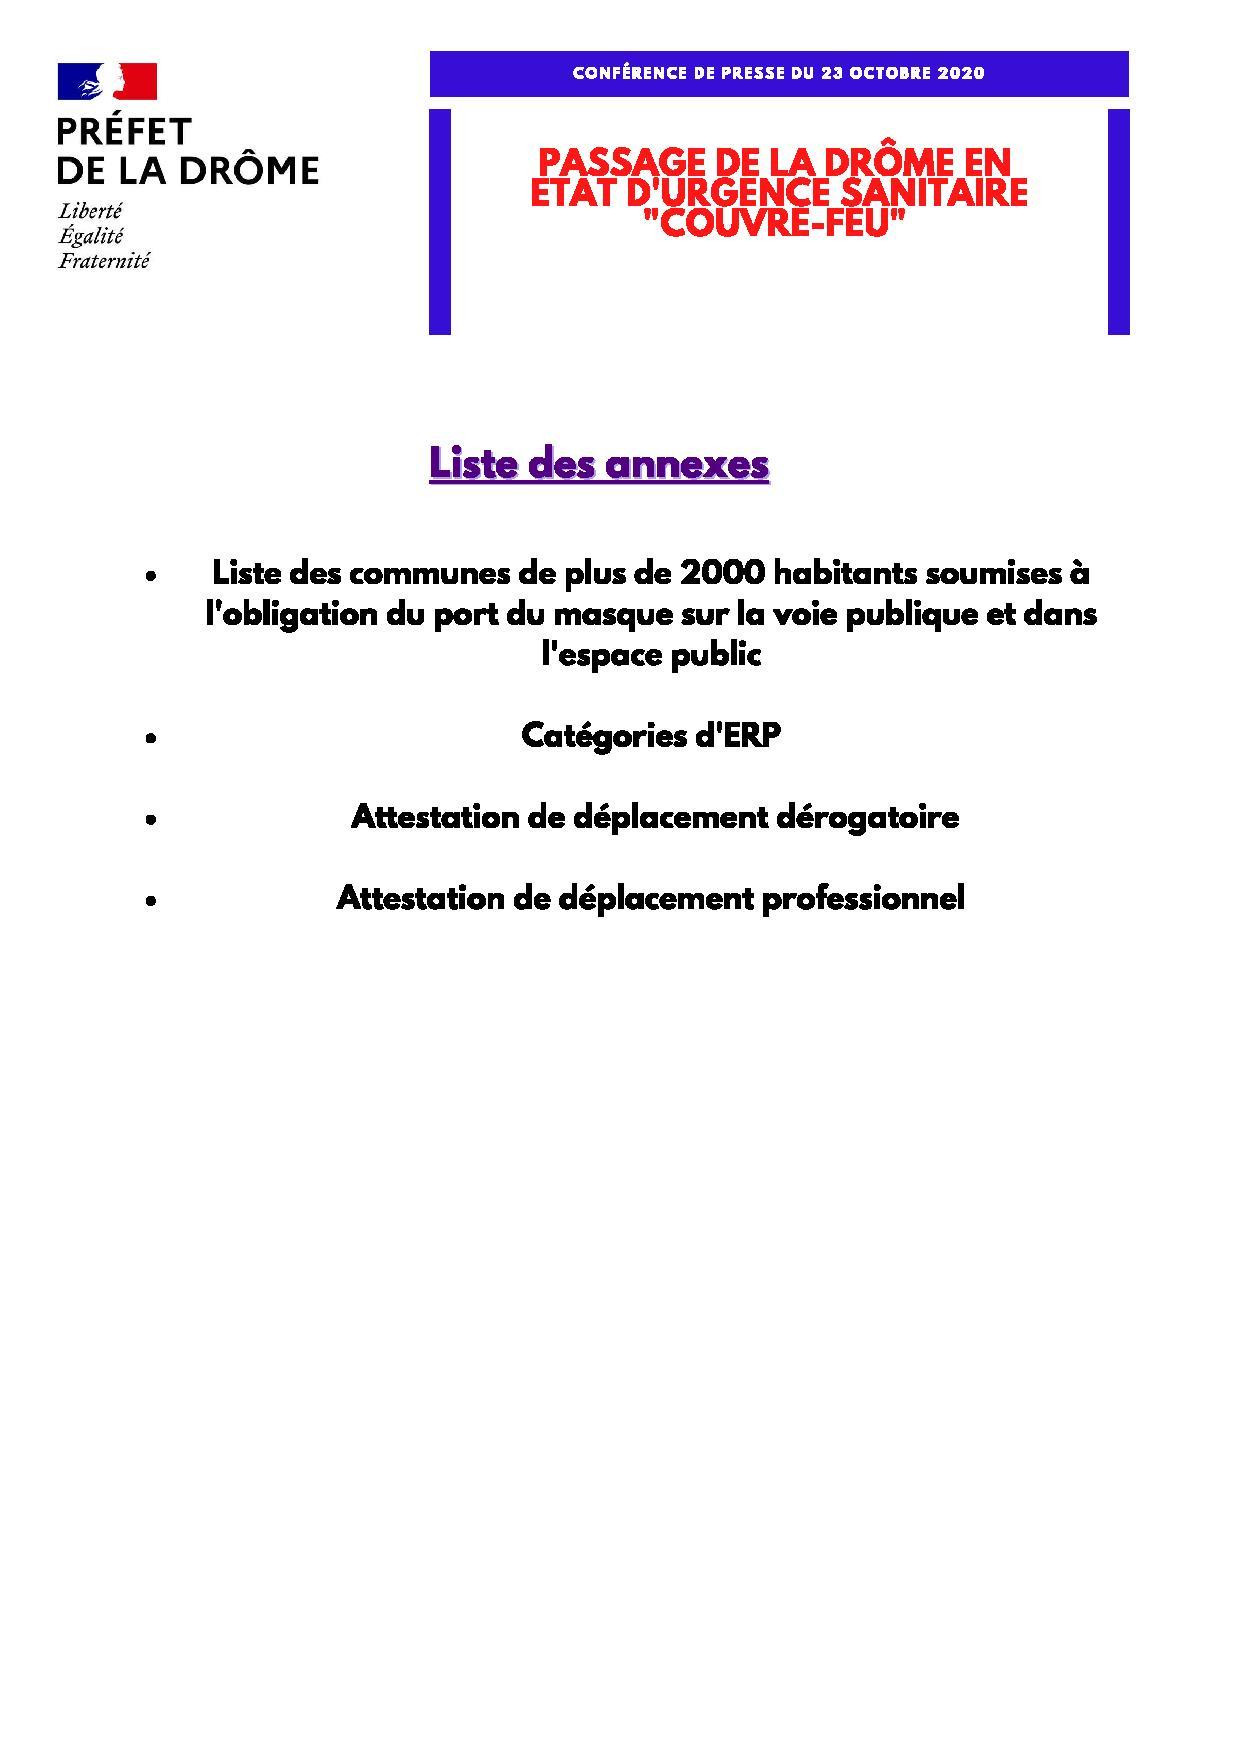 CONF PRESSE P5-page-001.jpg